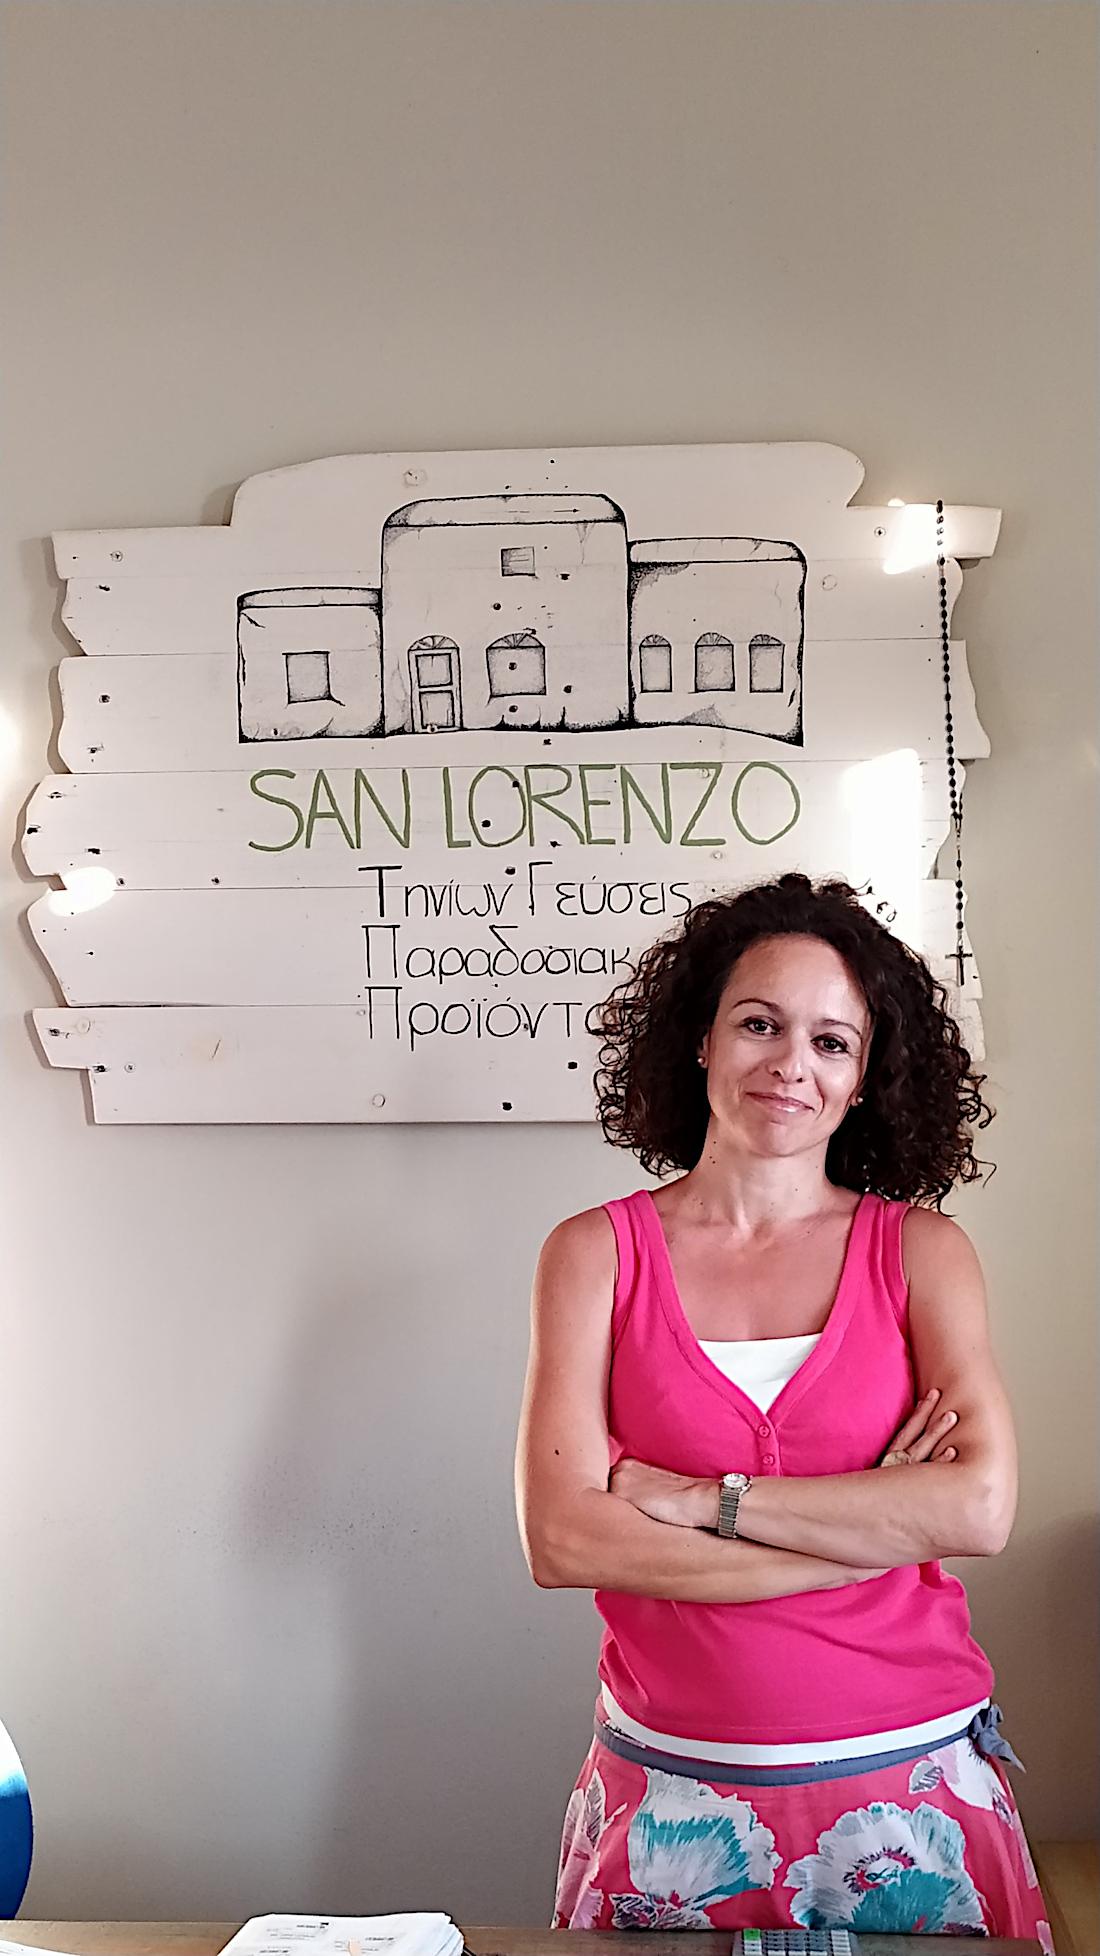 San Lorenzo παραδοσιακό τυροκομείο στην Τήνο